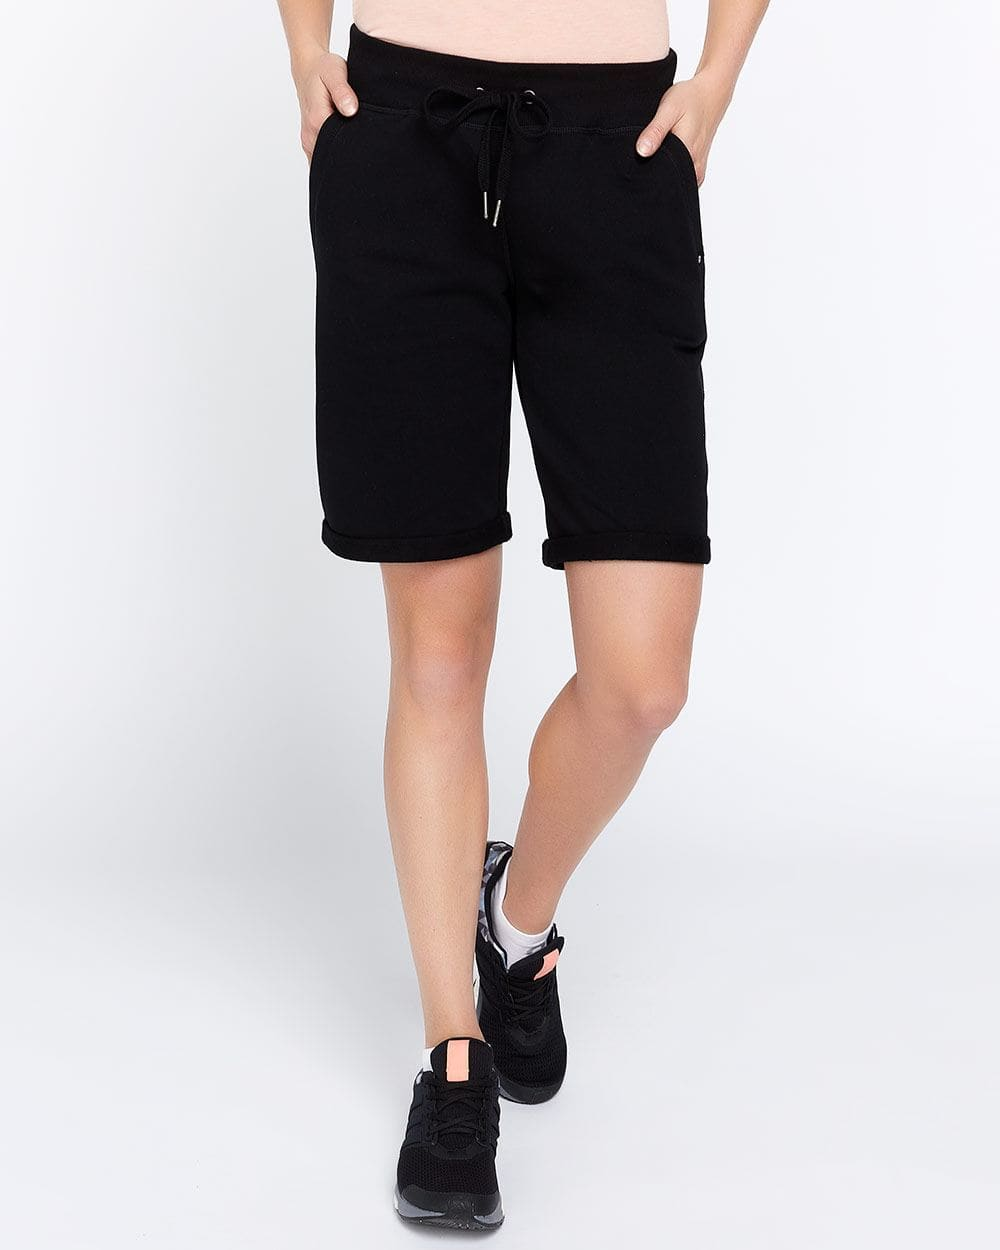 Hyba Bermuda Shorts